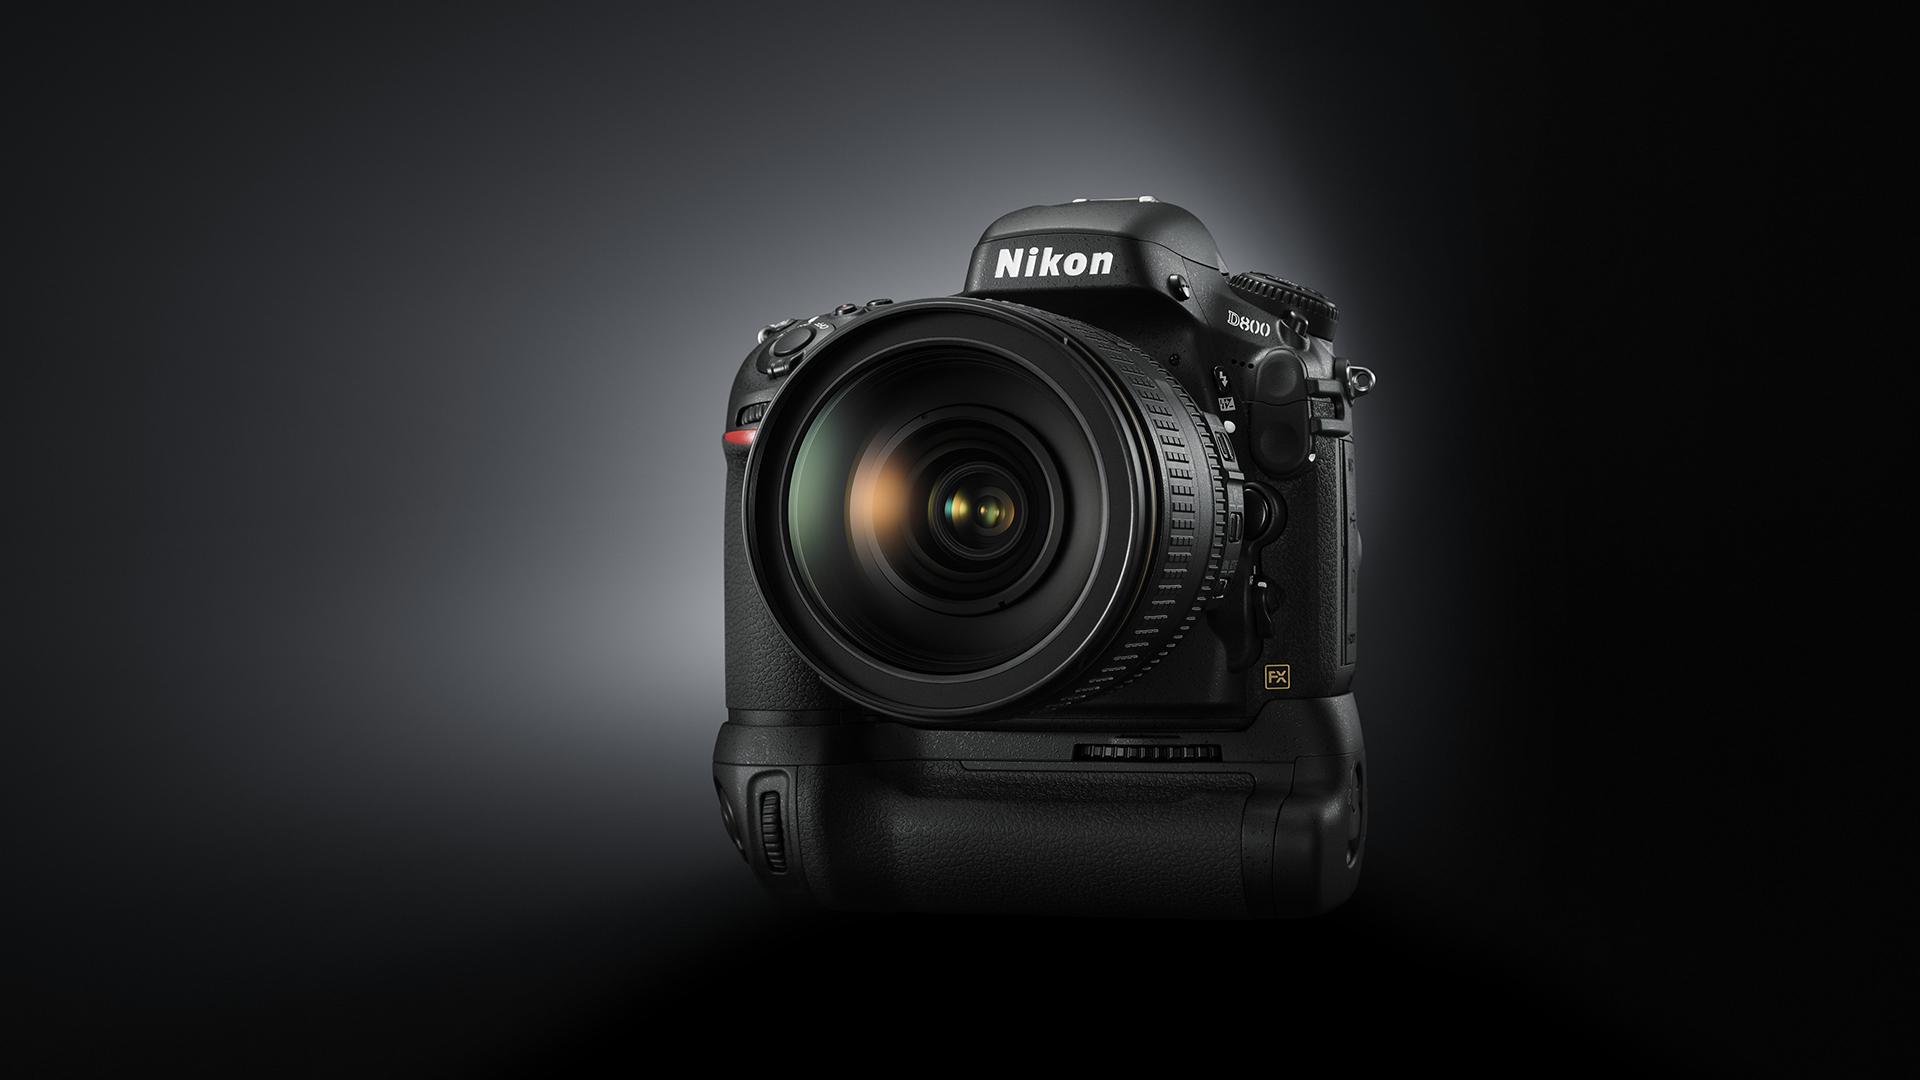 Images Camera Nikon D800 Closeup 1920x1080